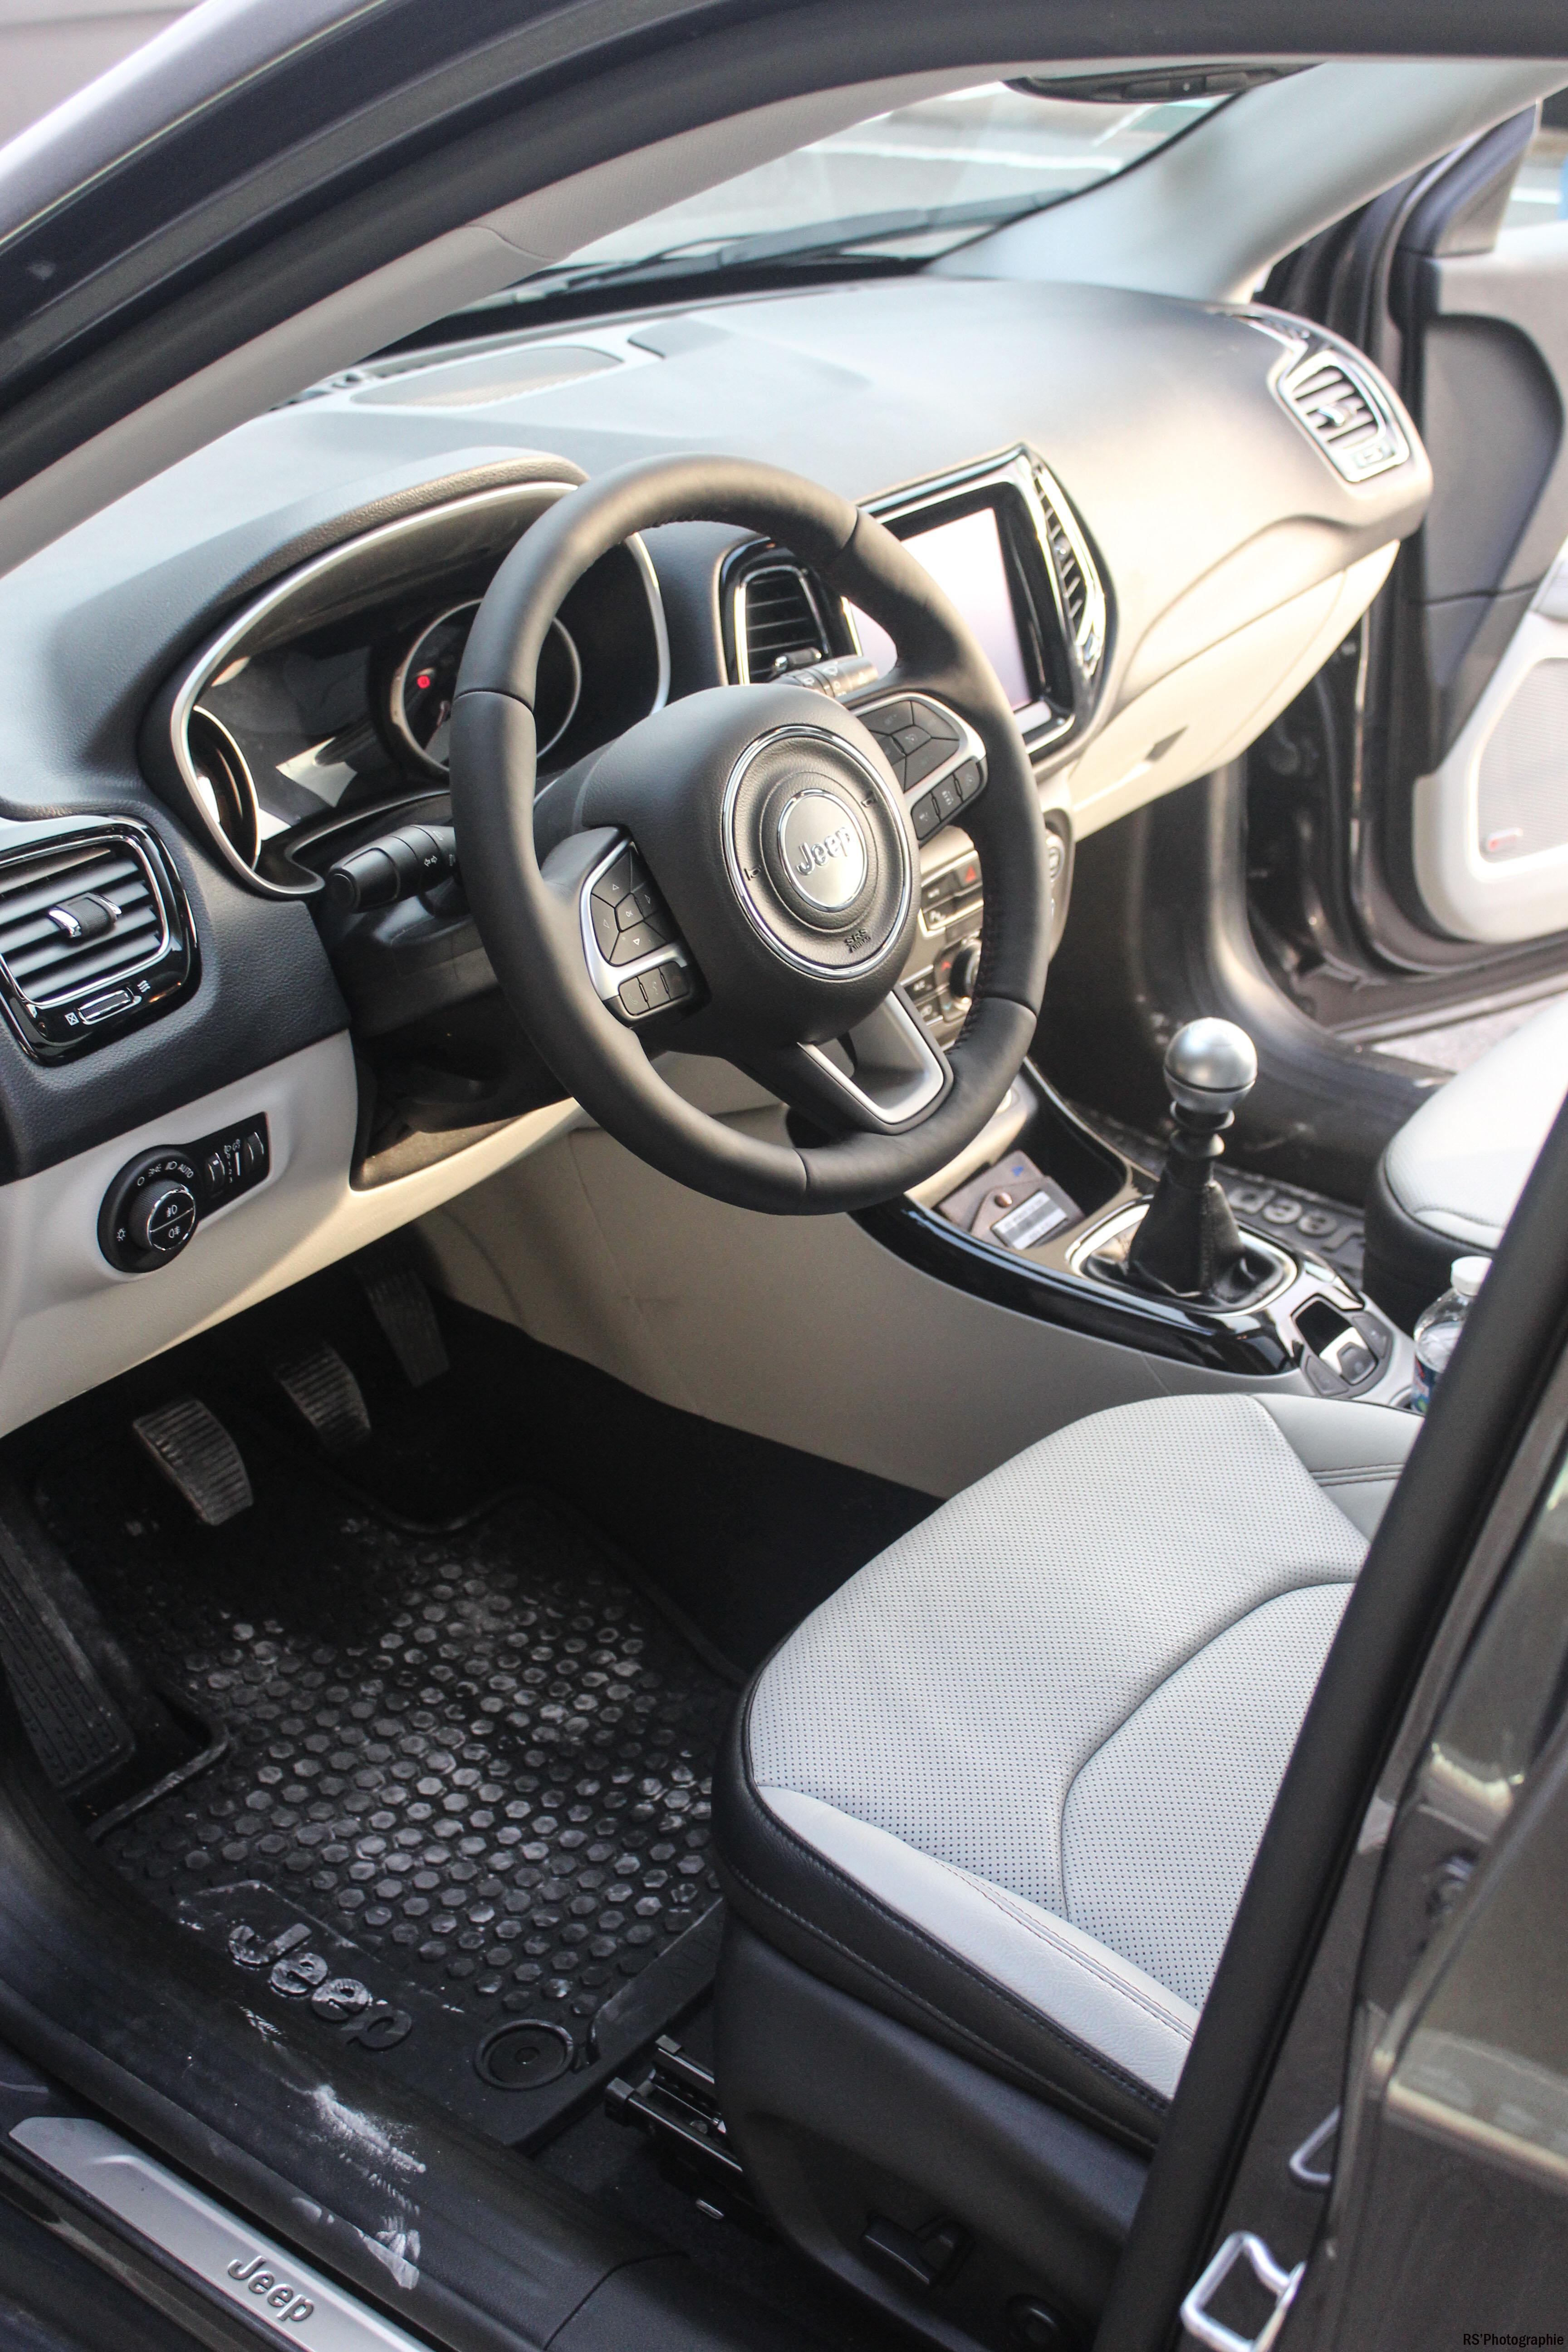 jeepcompass91-jeep-compass-intérieur-onboard-Arnaud Demasier-RSPhotographie